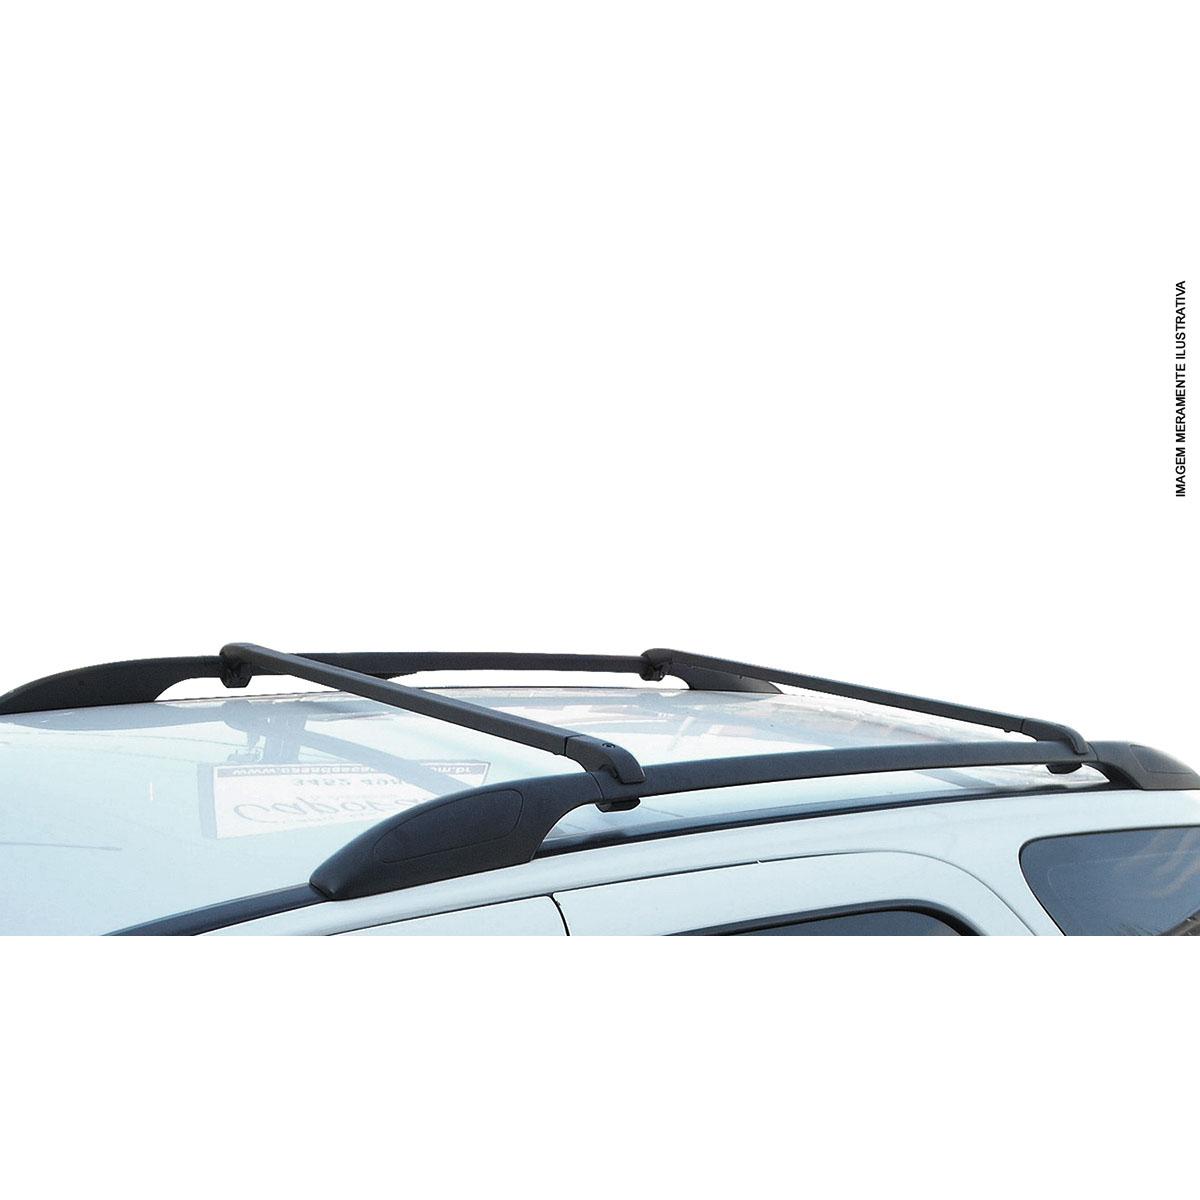 Travessa rack de teto alumínio preta Tracker 1999 a 2009 kit 3 peças